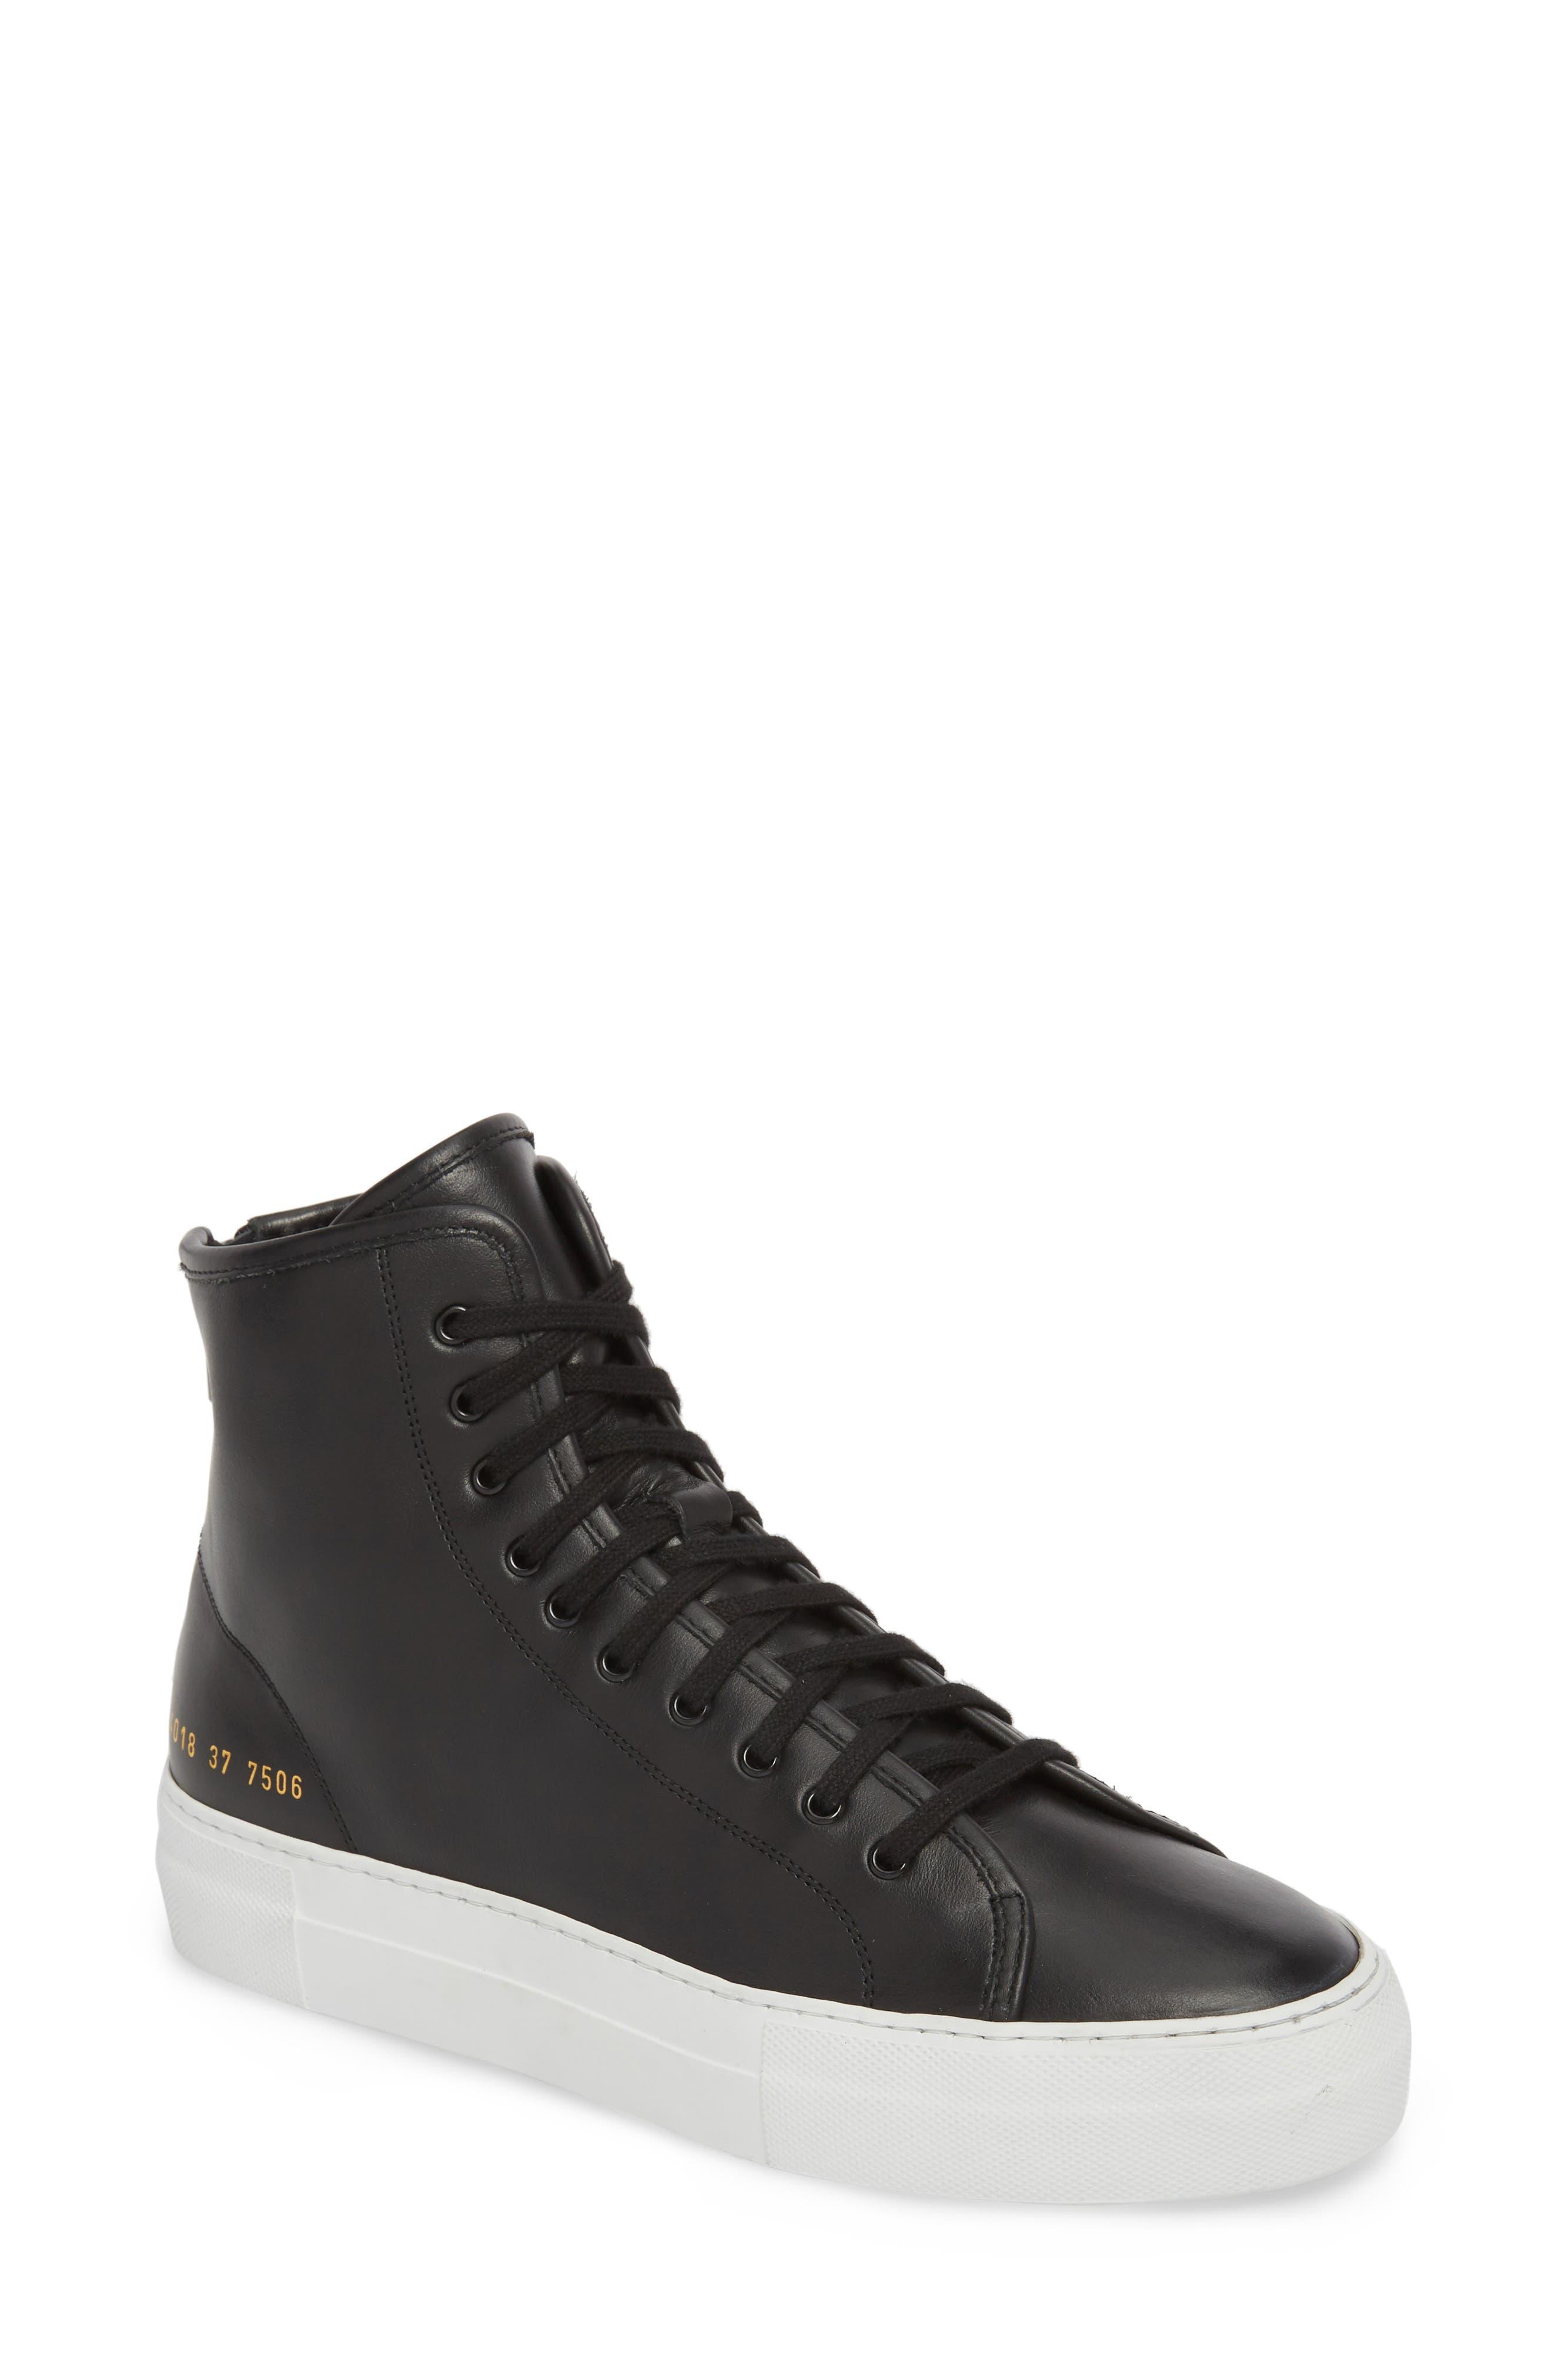 COMMON PROJECTS Tournament High Super Sneaker, Main, color, BLACK/ WHITE